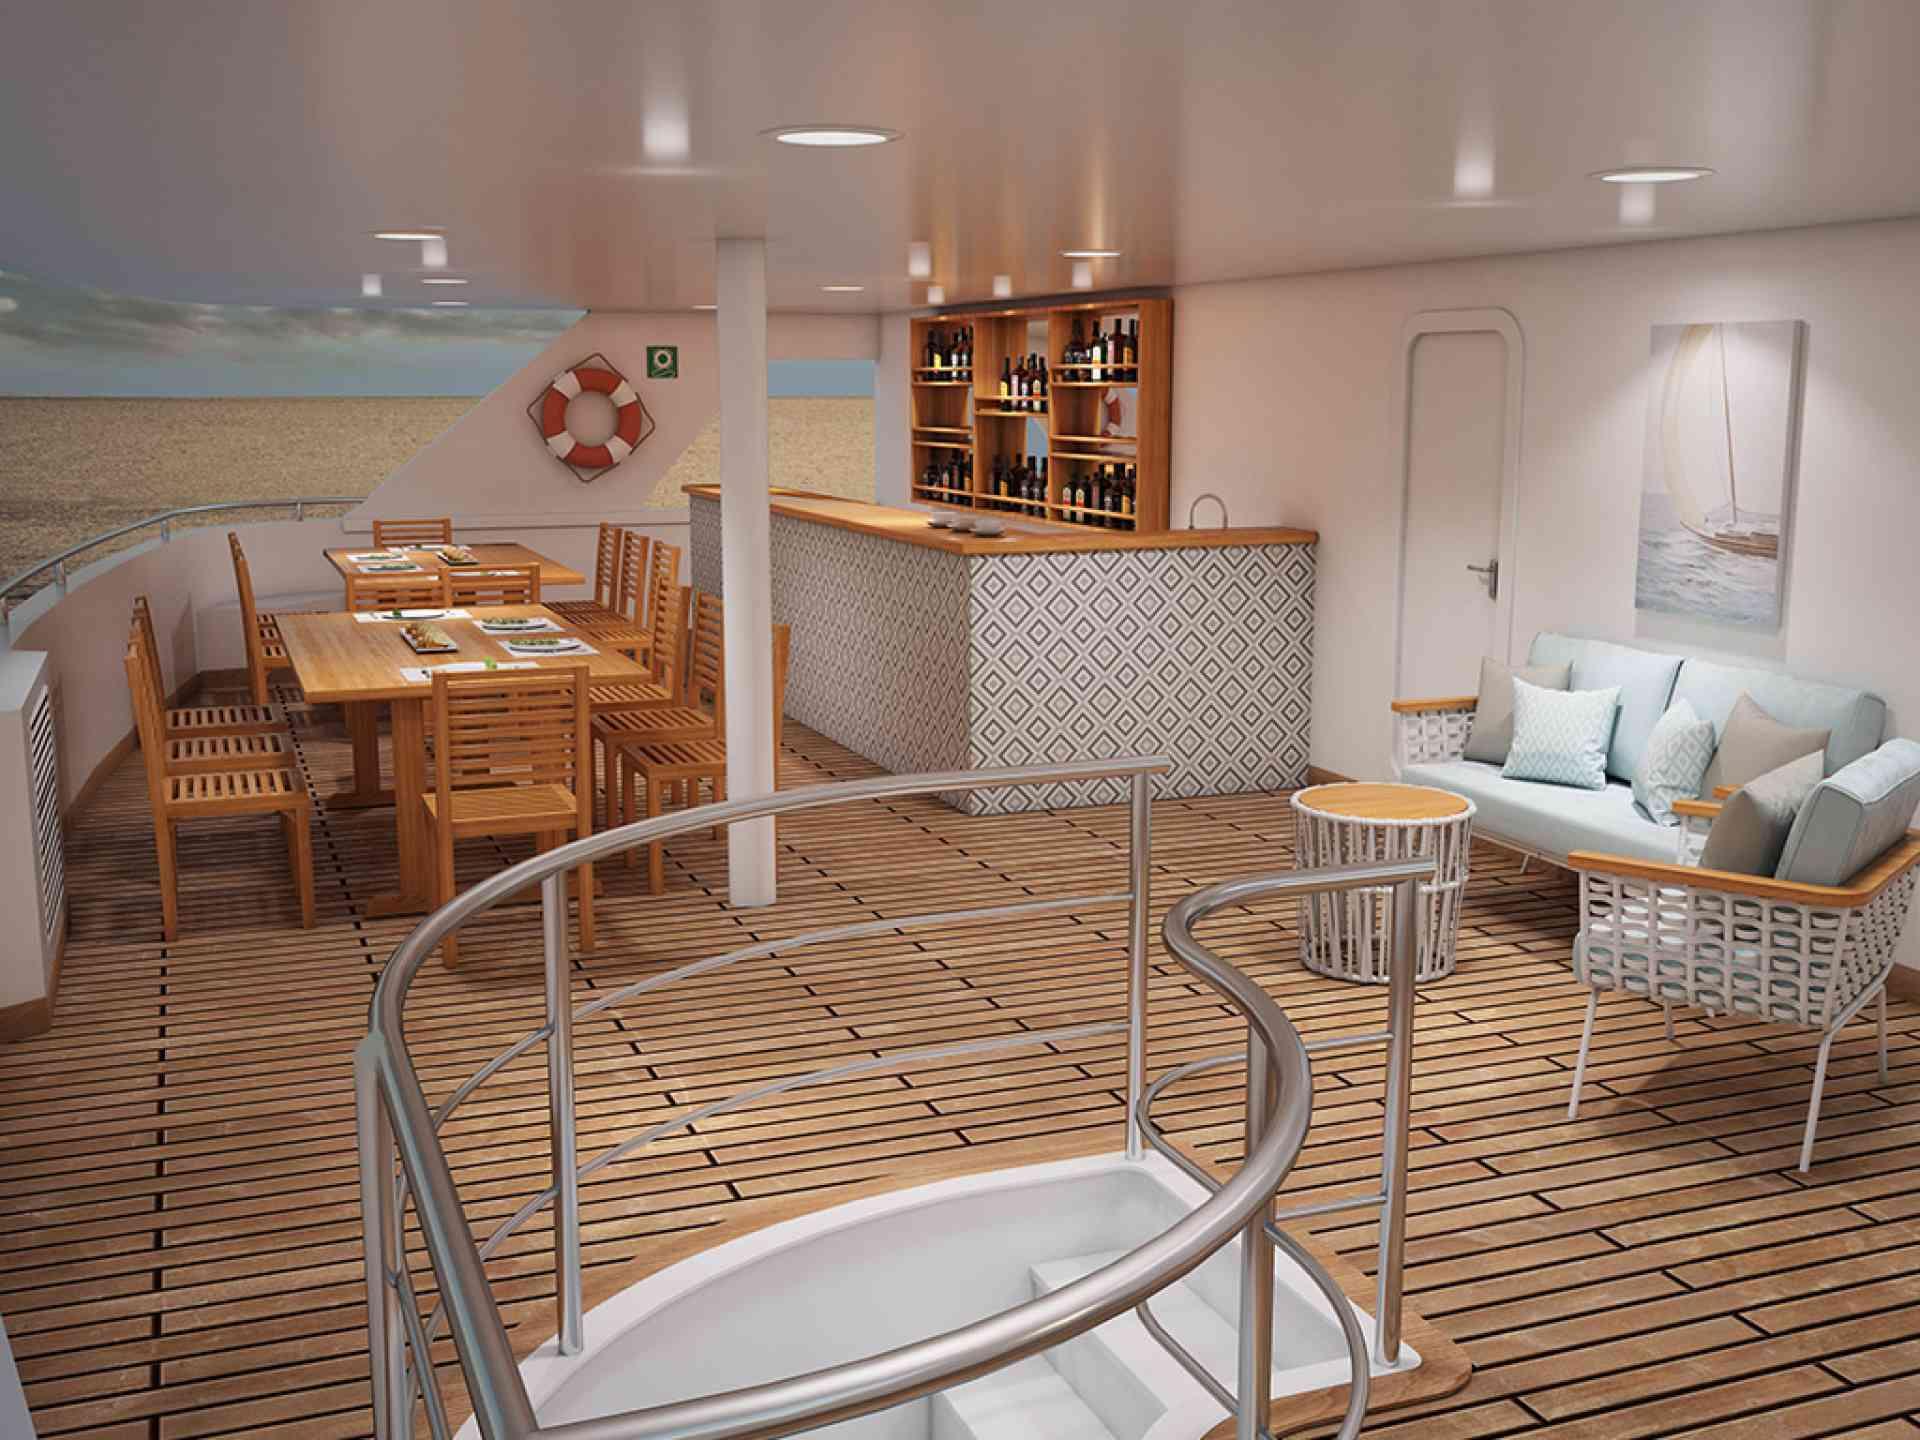 Ocean Spray luxury catamaran upper deck, Galapagos Islands, Ecuador